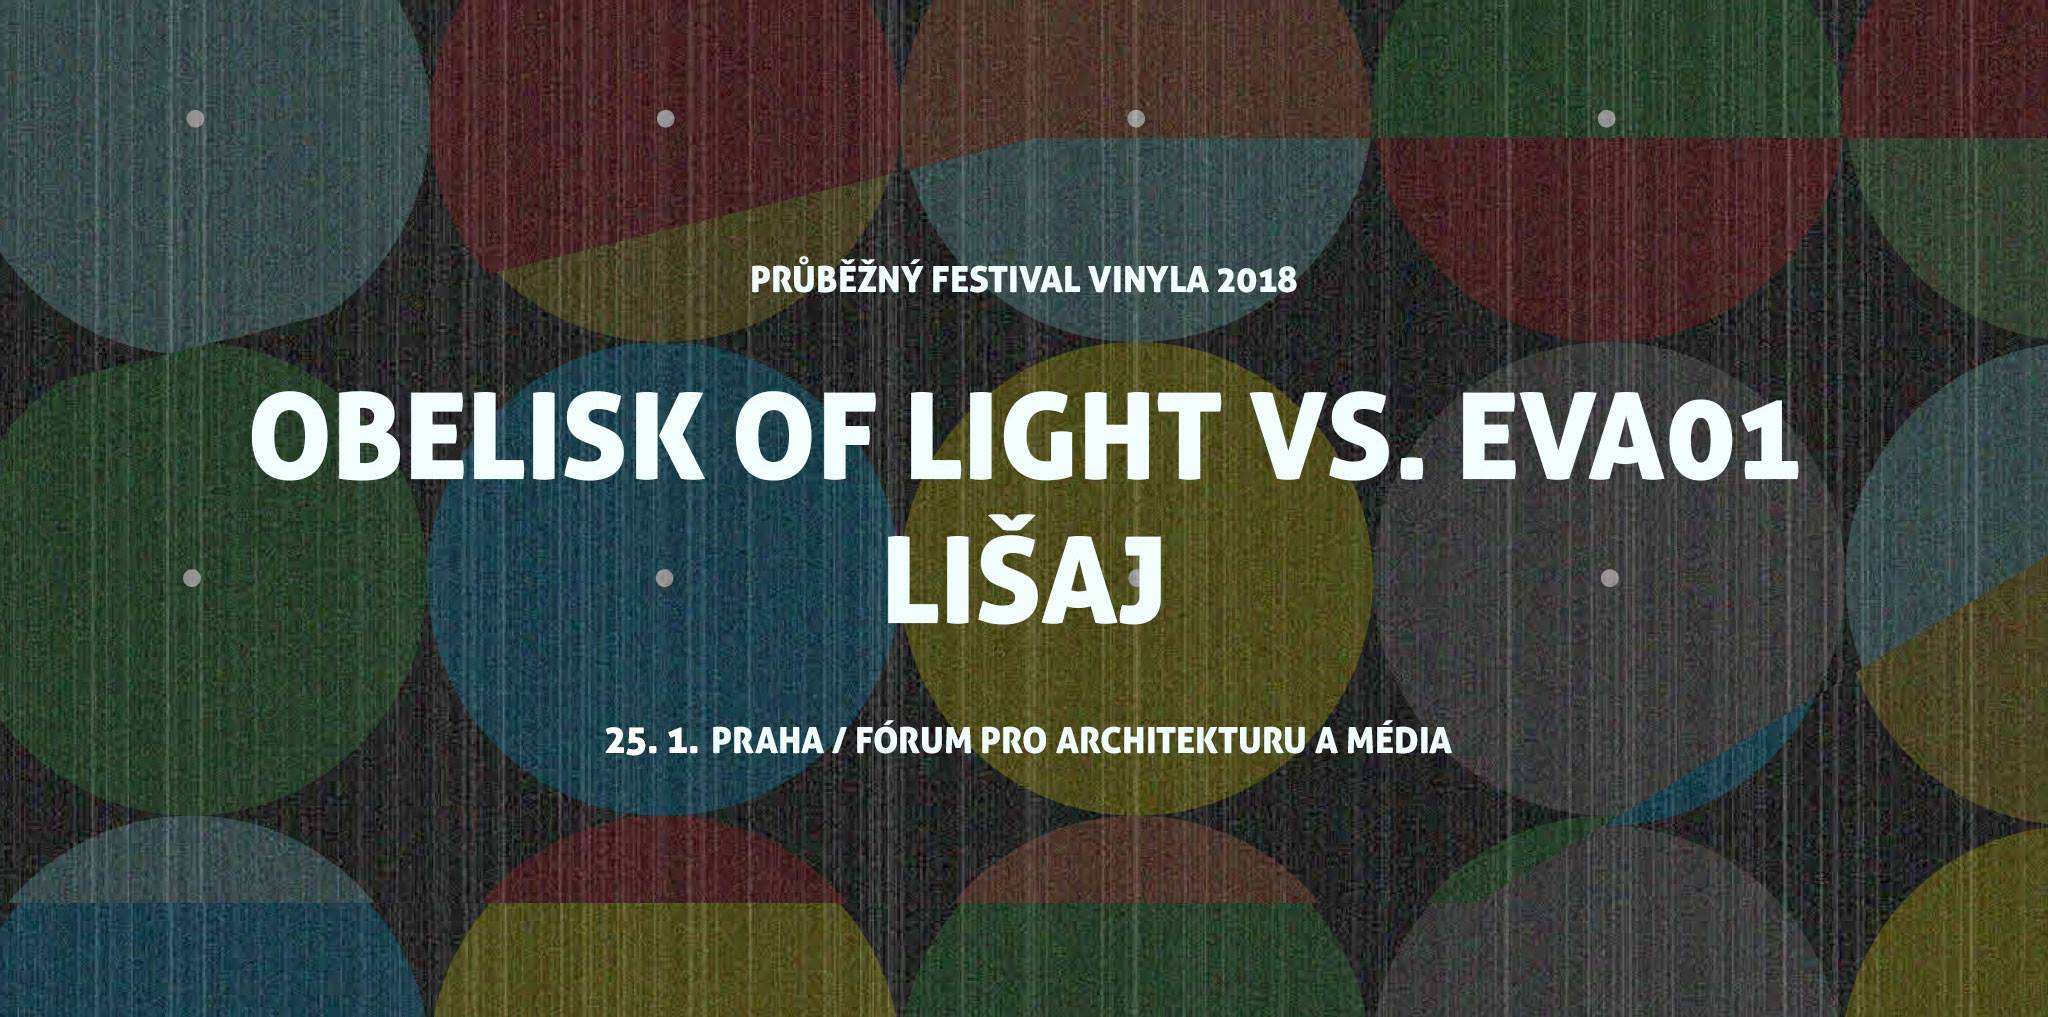 PÁ / 25.1. / 20.00 / Vinyla: Genot Centre Night – Obelisk of Light vs. eva01 + Lišaj / koncert